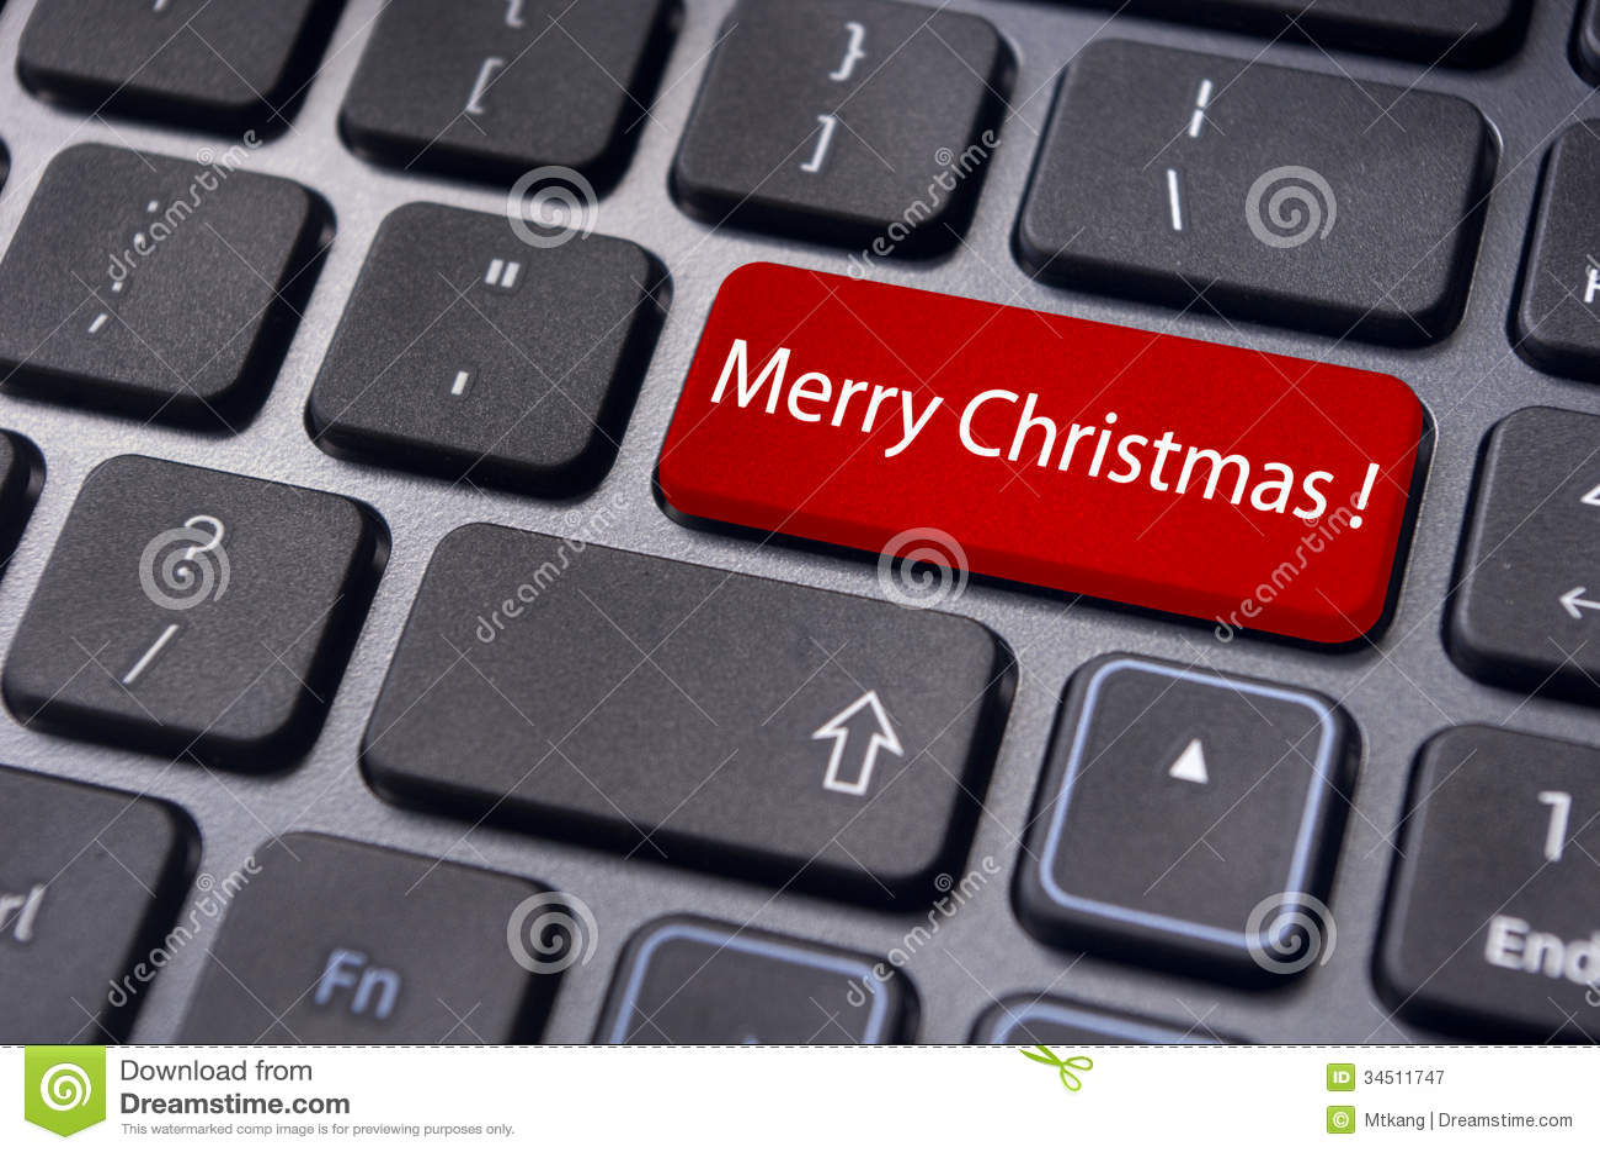 Merry Christmas Greetings On Keyboard Enter Key Stock Illustration